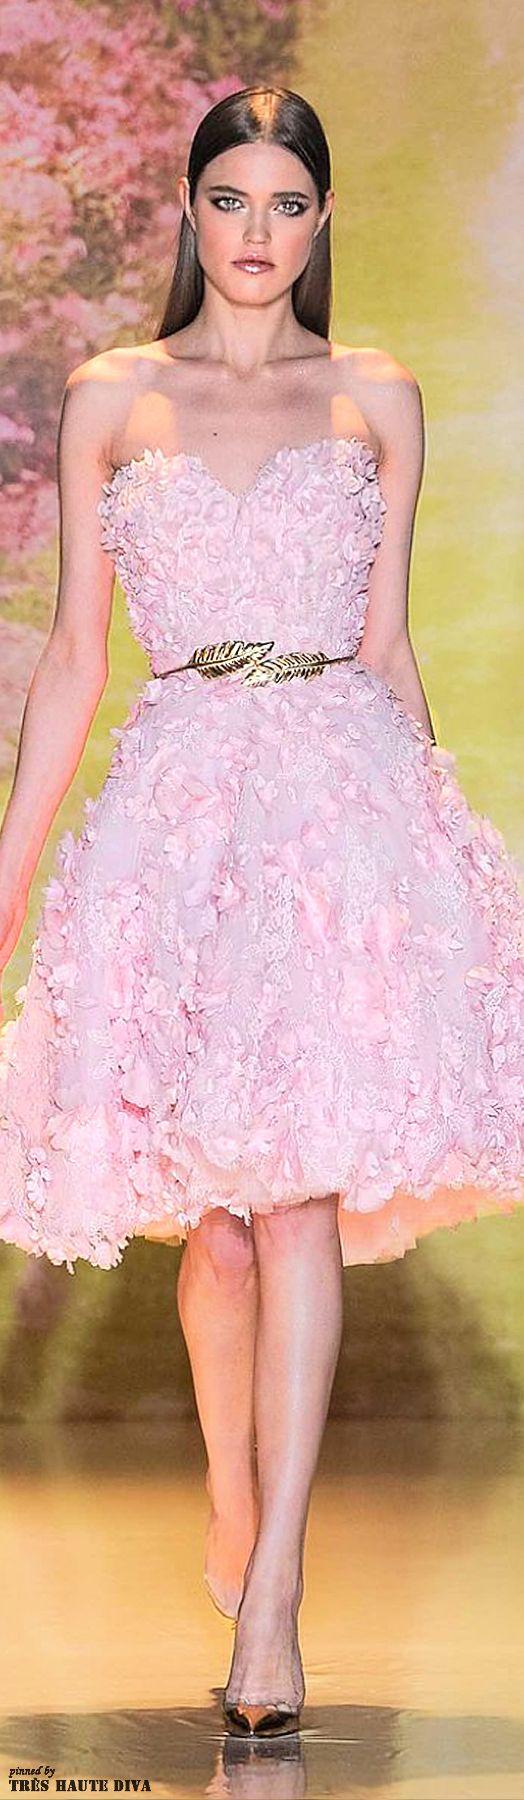 438 best Gorgeous Gowns/Dresses images on Pinterest | Groom attire ...